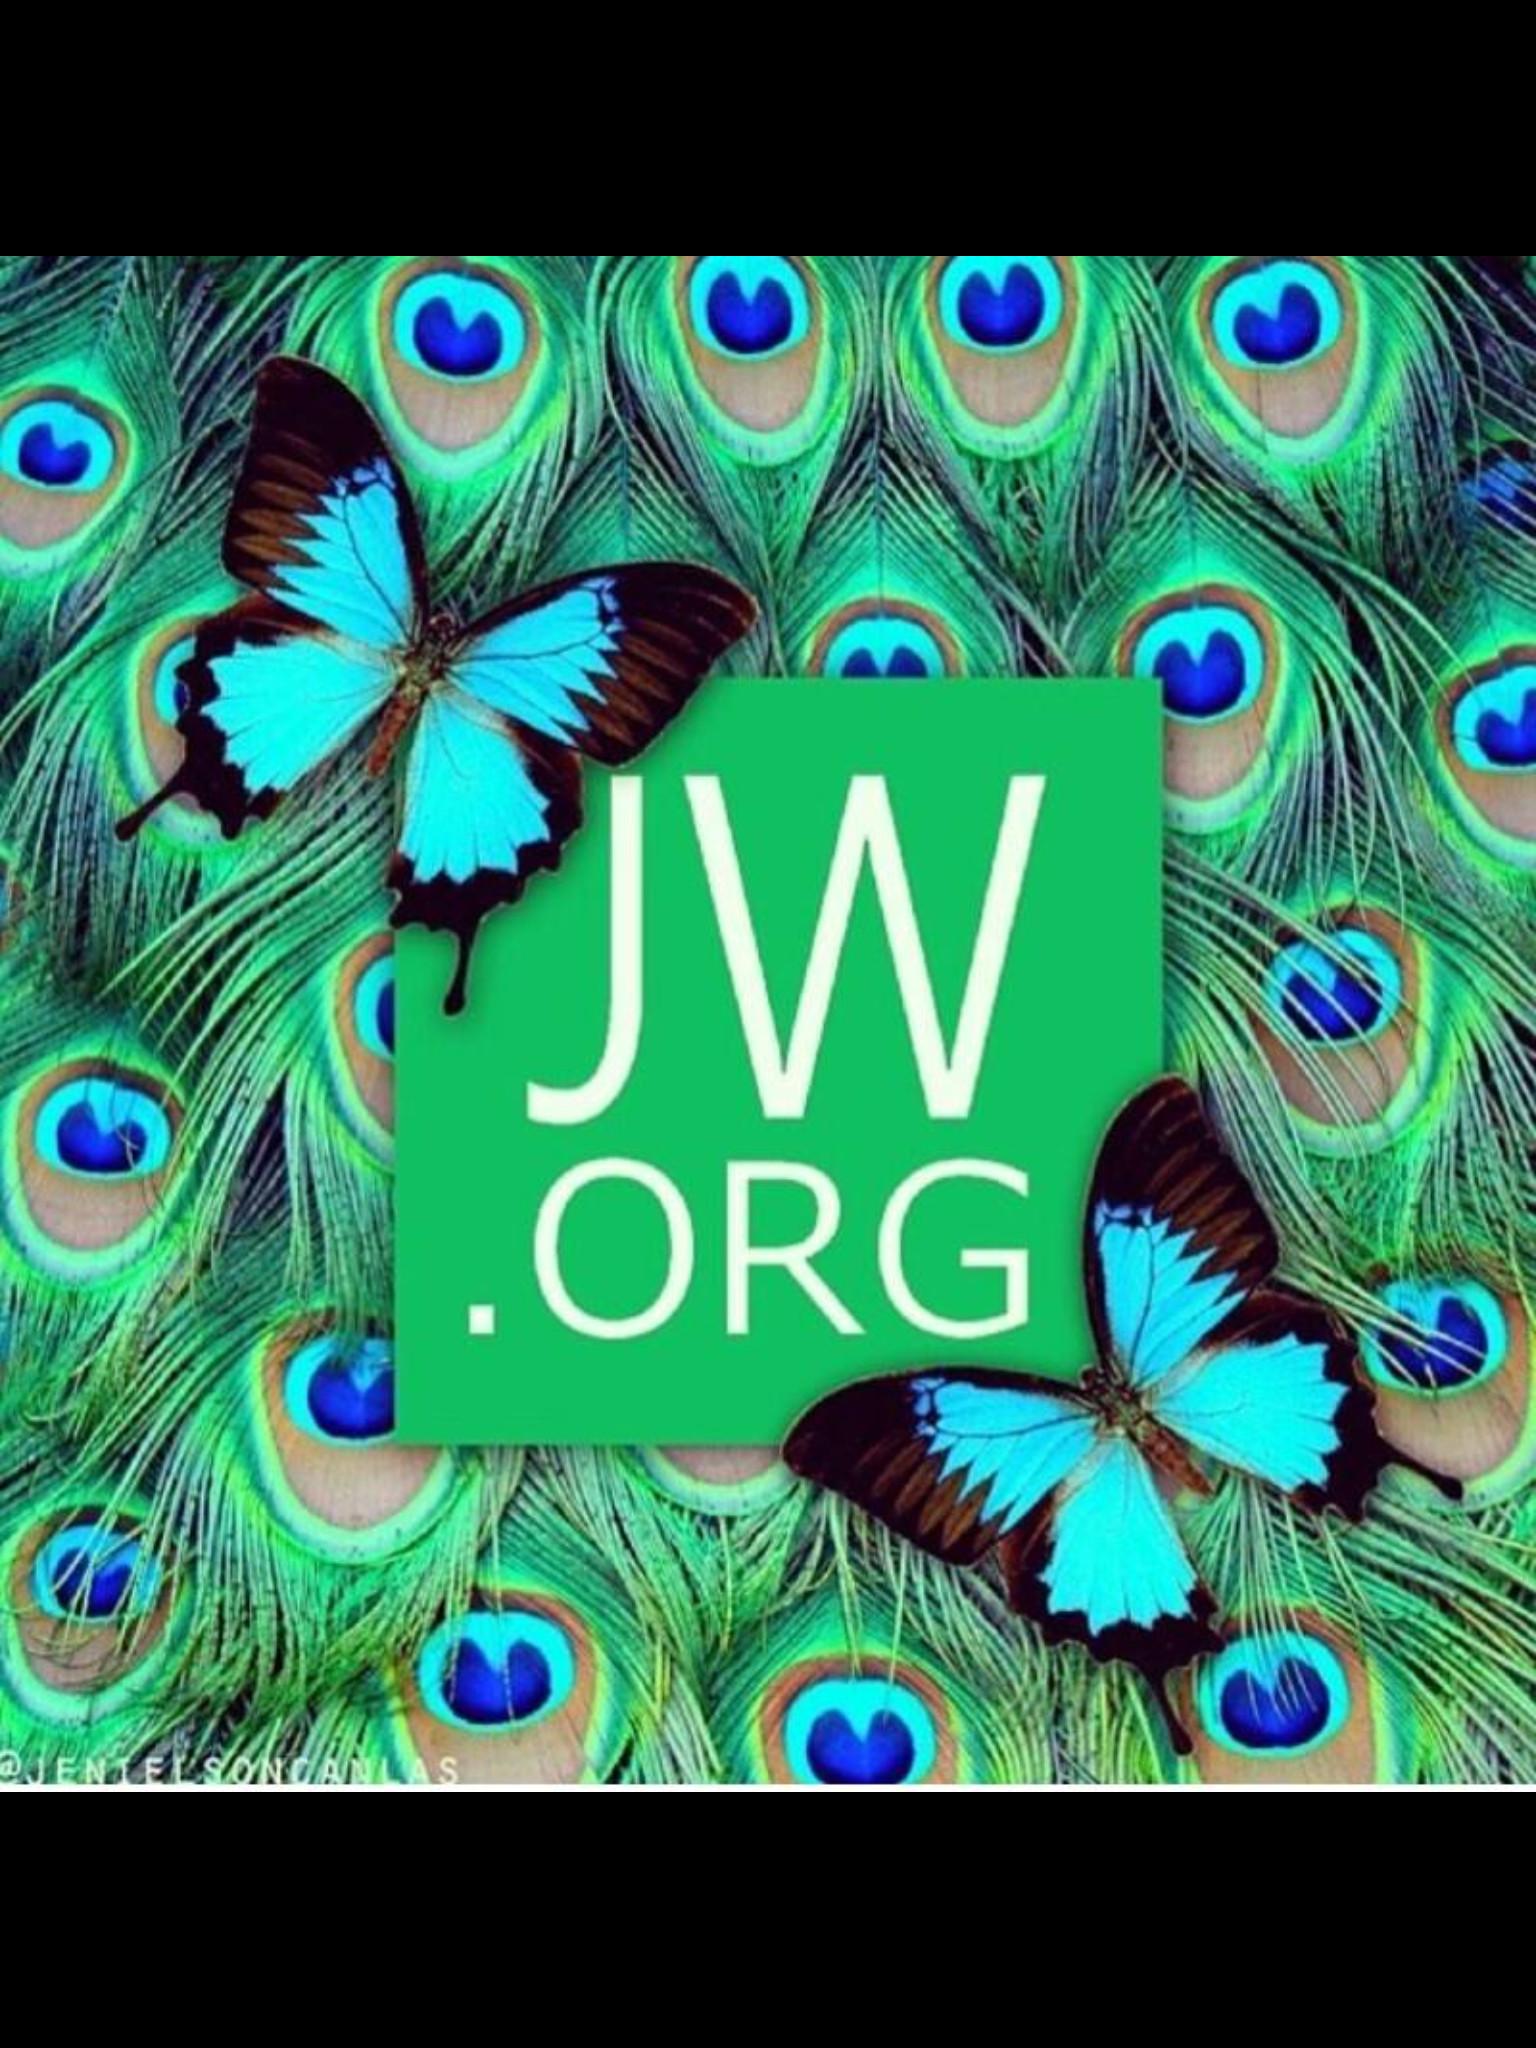 Jw Broadcasting Songs